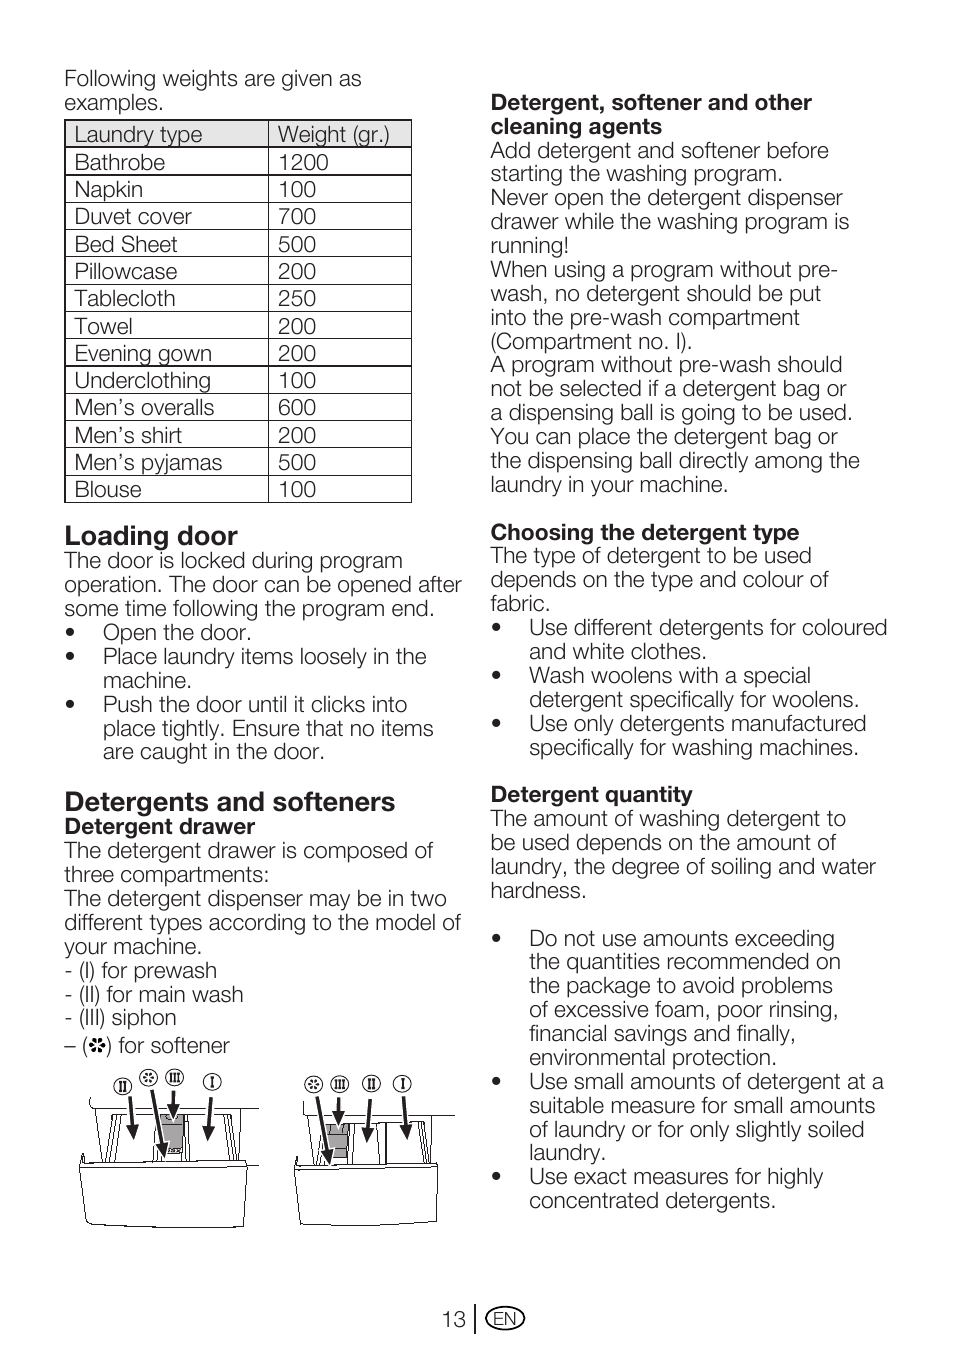 loading door detergents and softeners beko wm 5140 w user manual rh manualsdir com